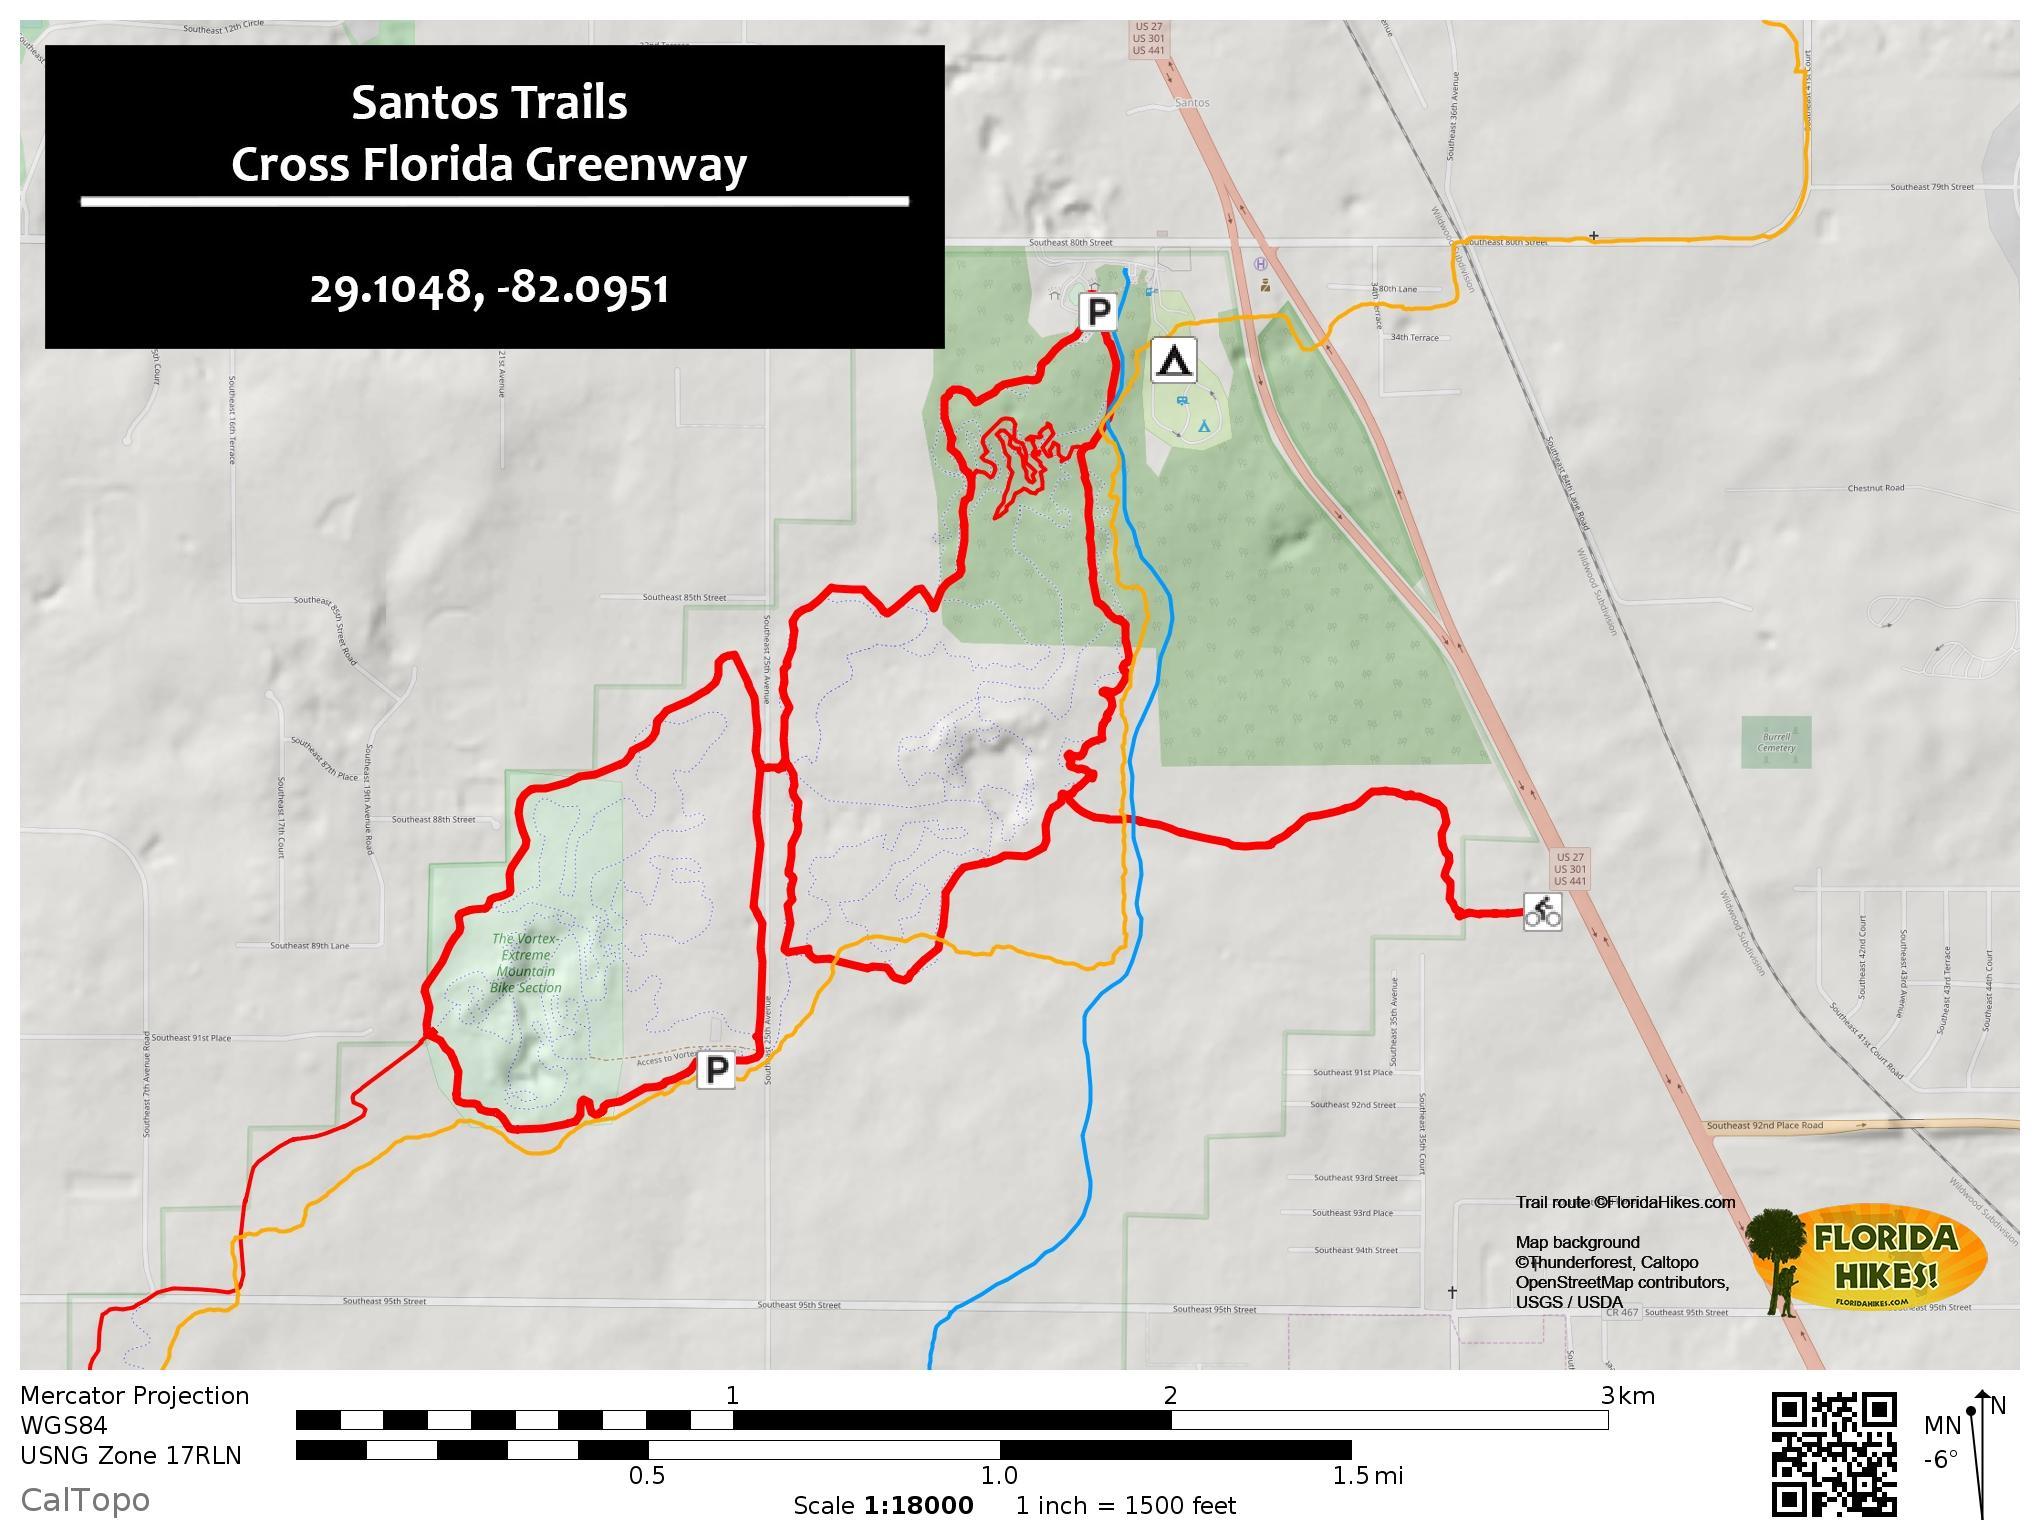 Biking Santos Trails | Florida Trail Cross Florida Greenway ...